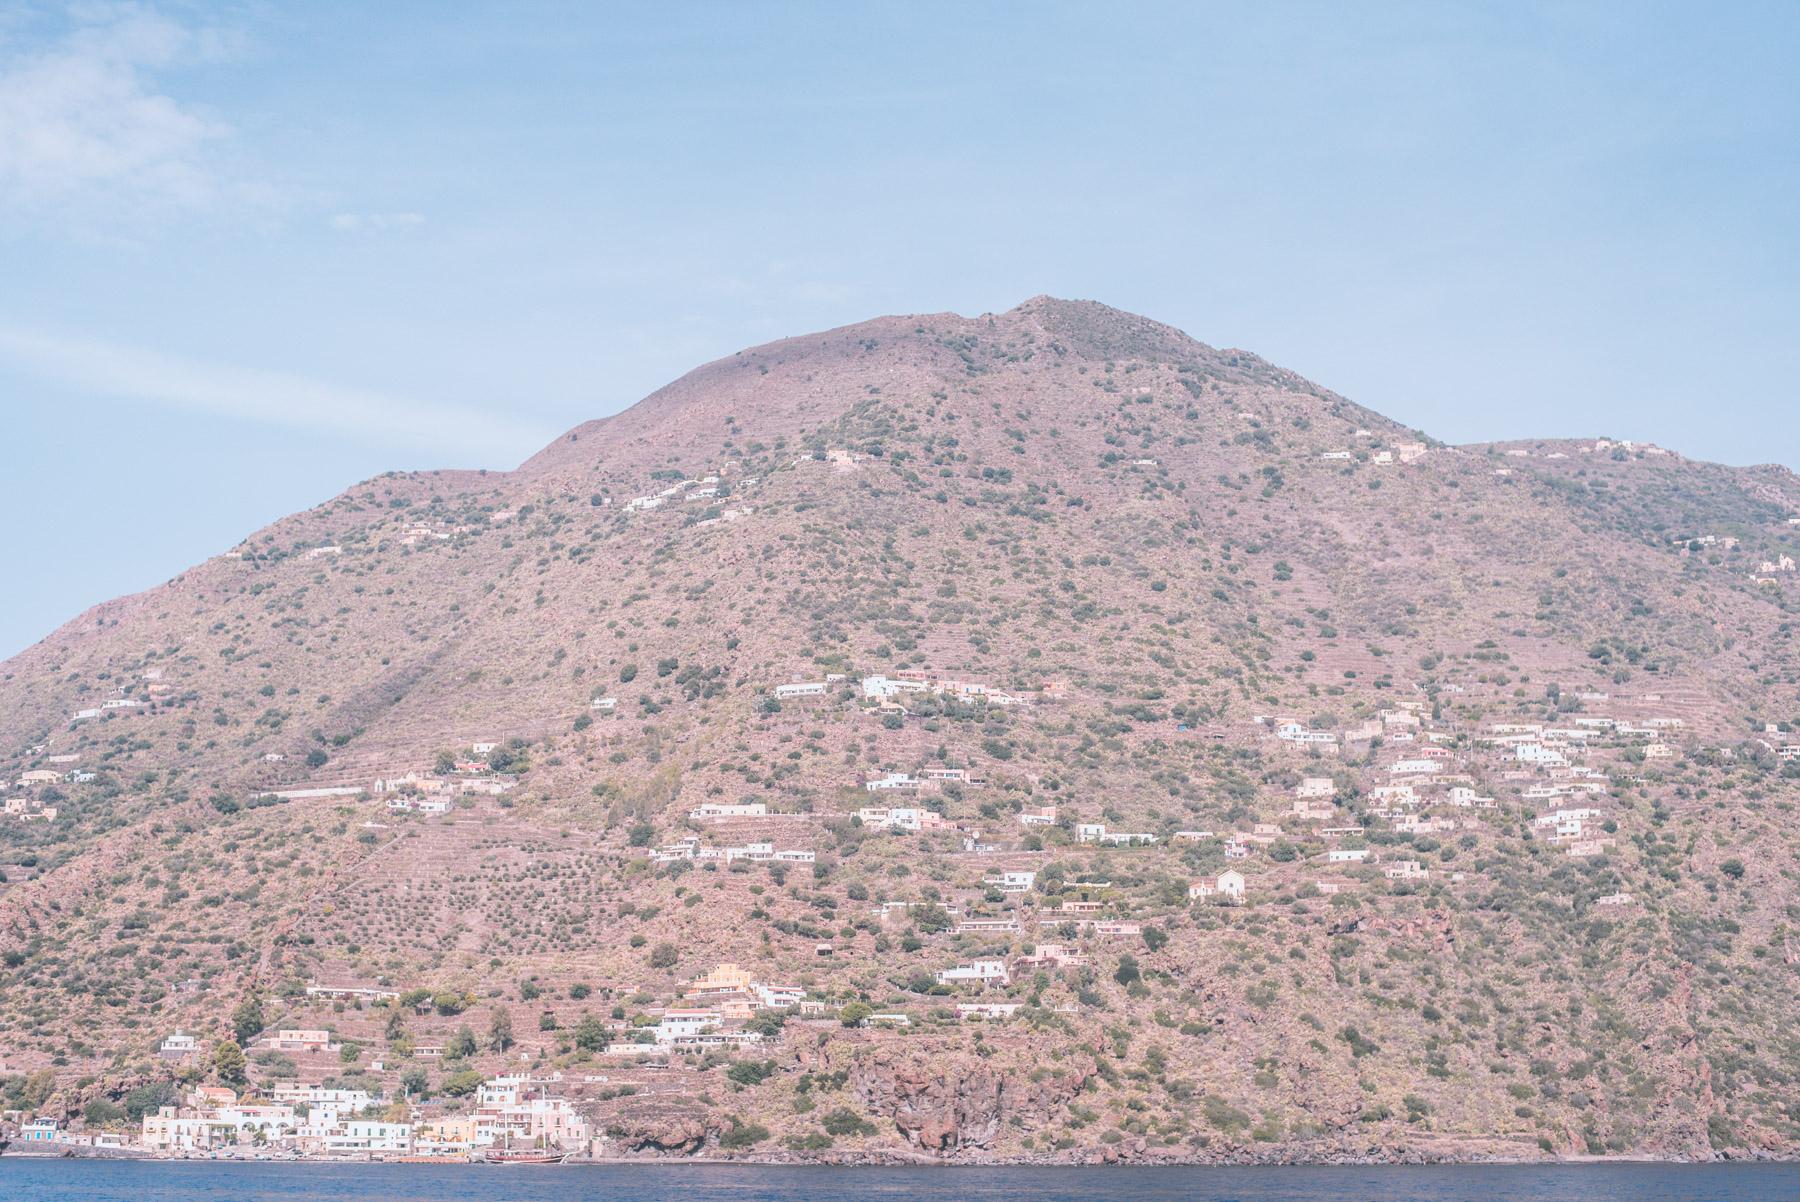 lipari, salina, vulcano, stromboli, alicudi, filicudi, panarea are the small aeolian islands with few white houses